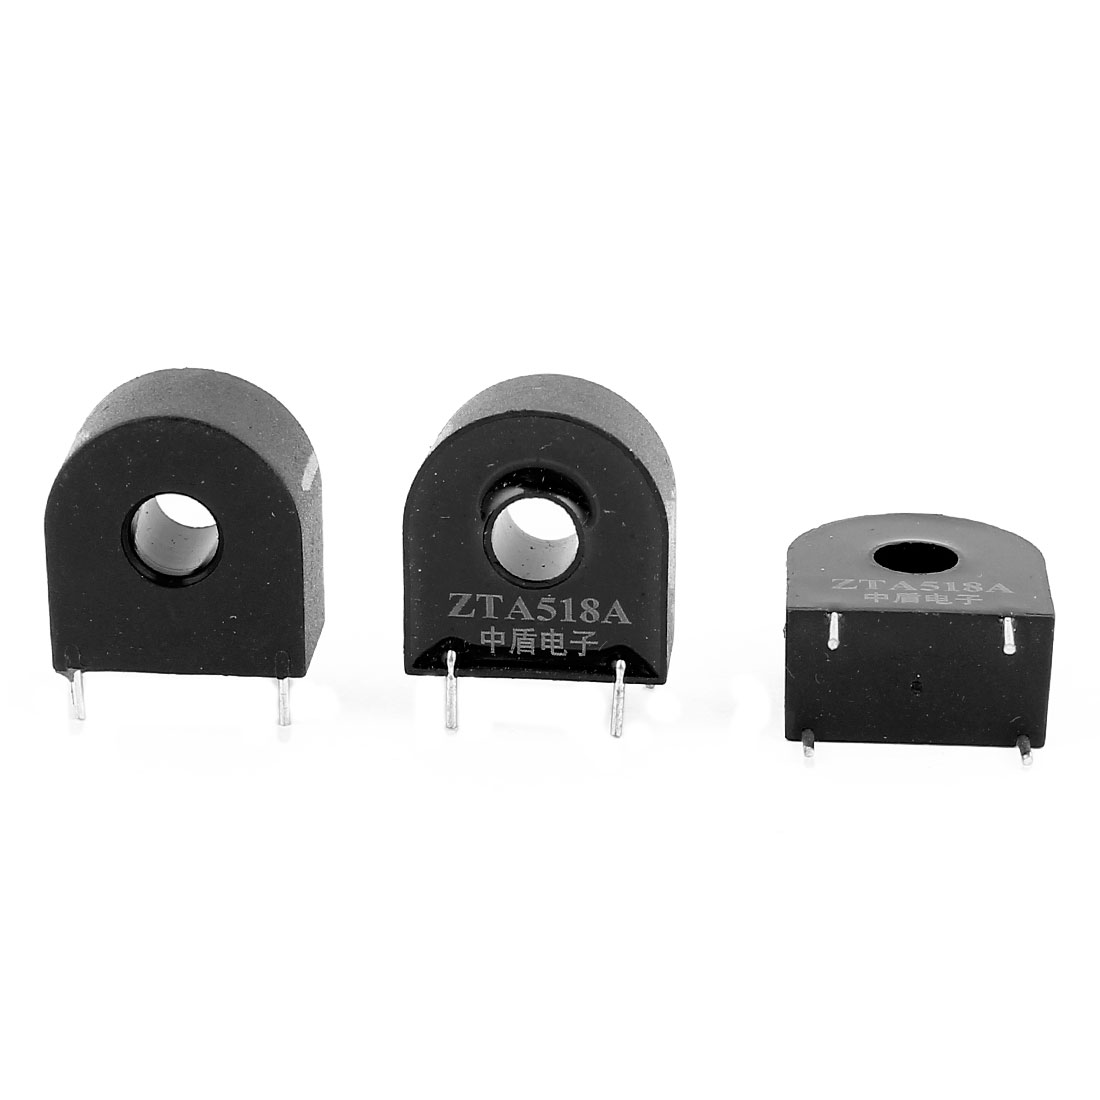 ZTA518A 20A/10mA 4 Terminal Precision AC Micro Current Transformer Sensor 3Pcs